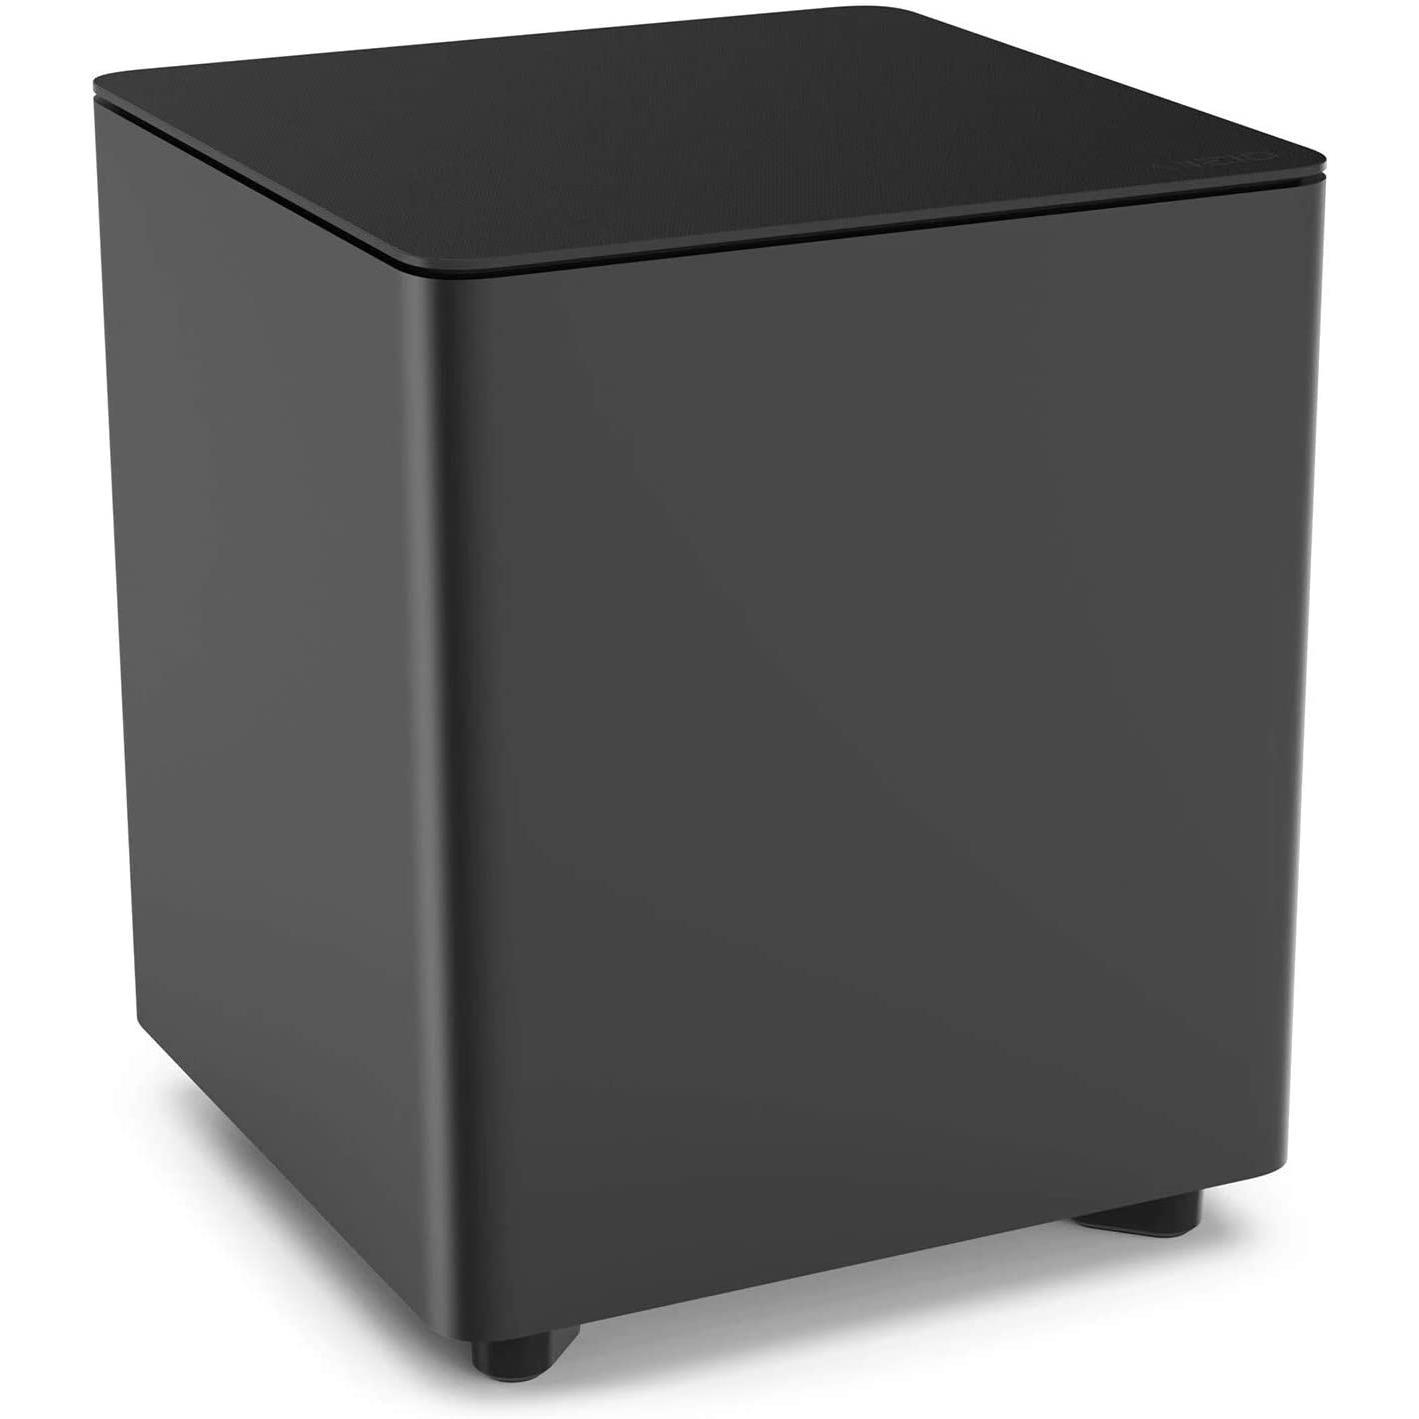 Soundbar Vizio V51-H6B-RB - Black